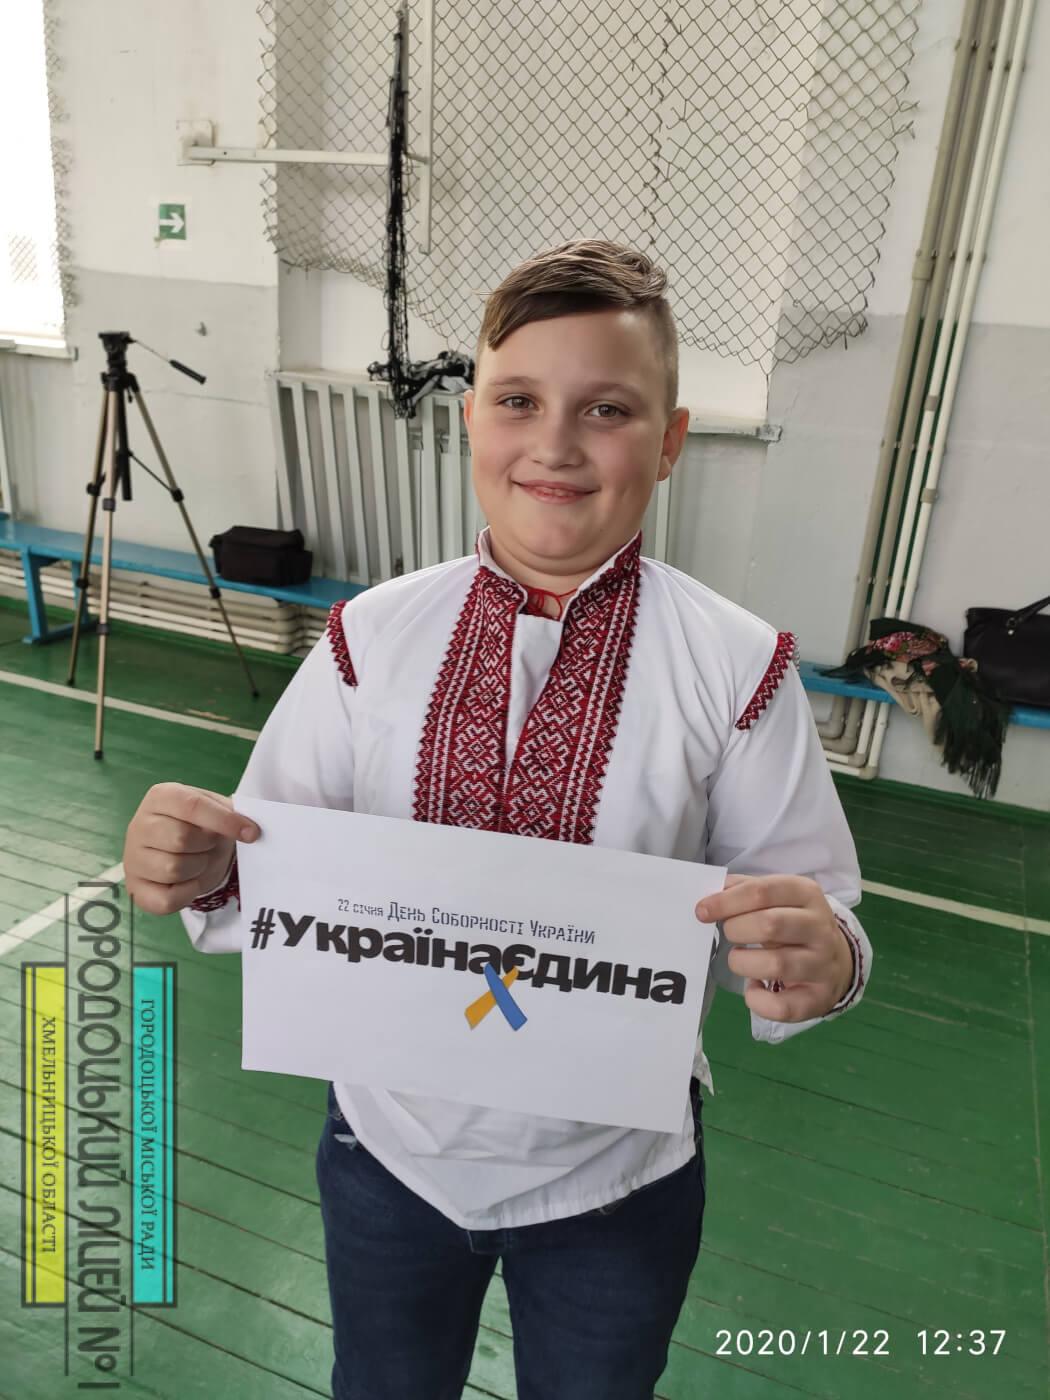 IMG 20200122 123711 e1579705450216 - День Соборності України